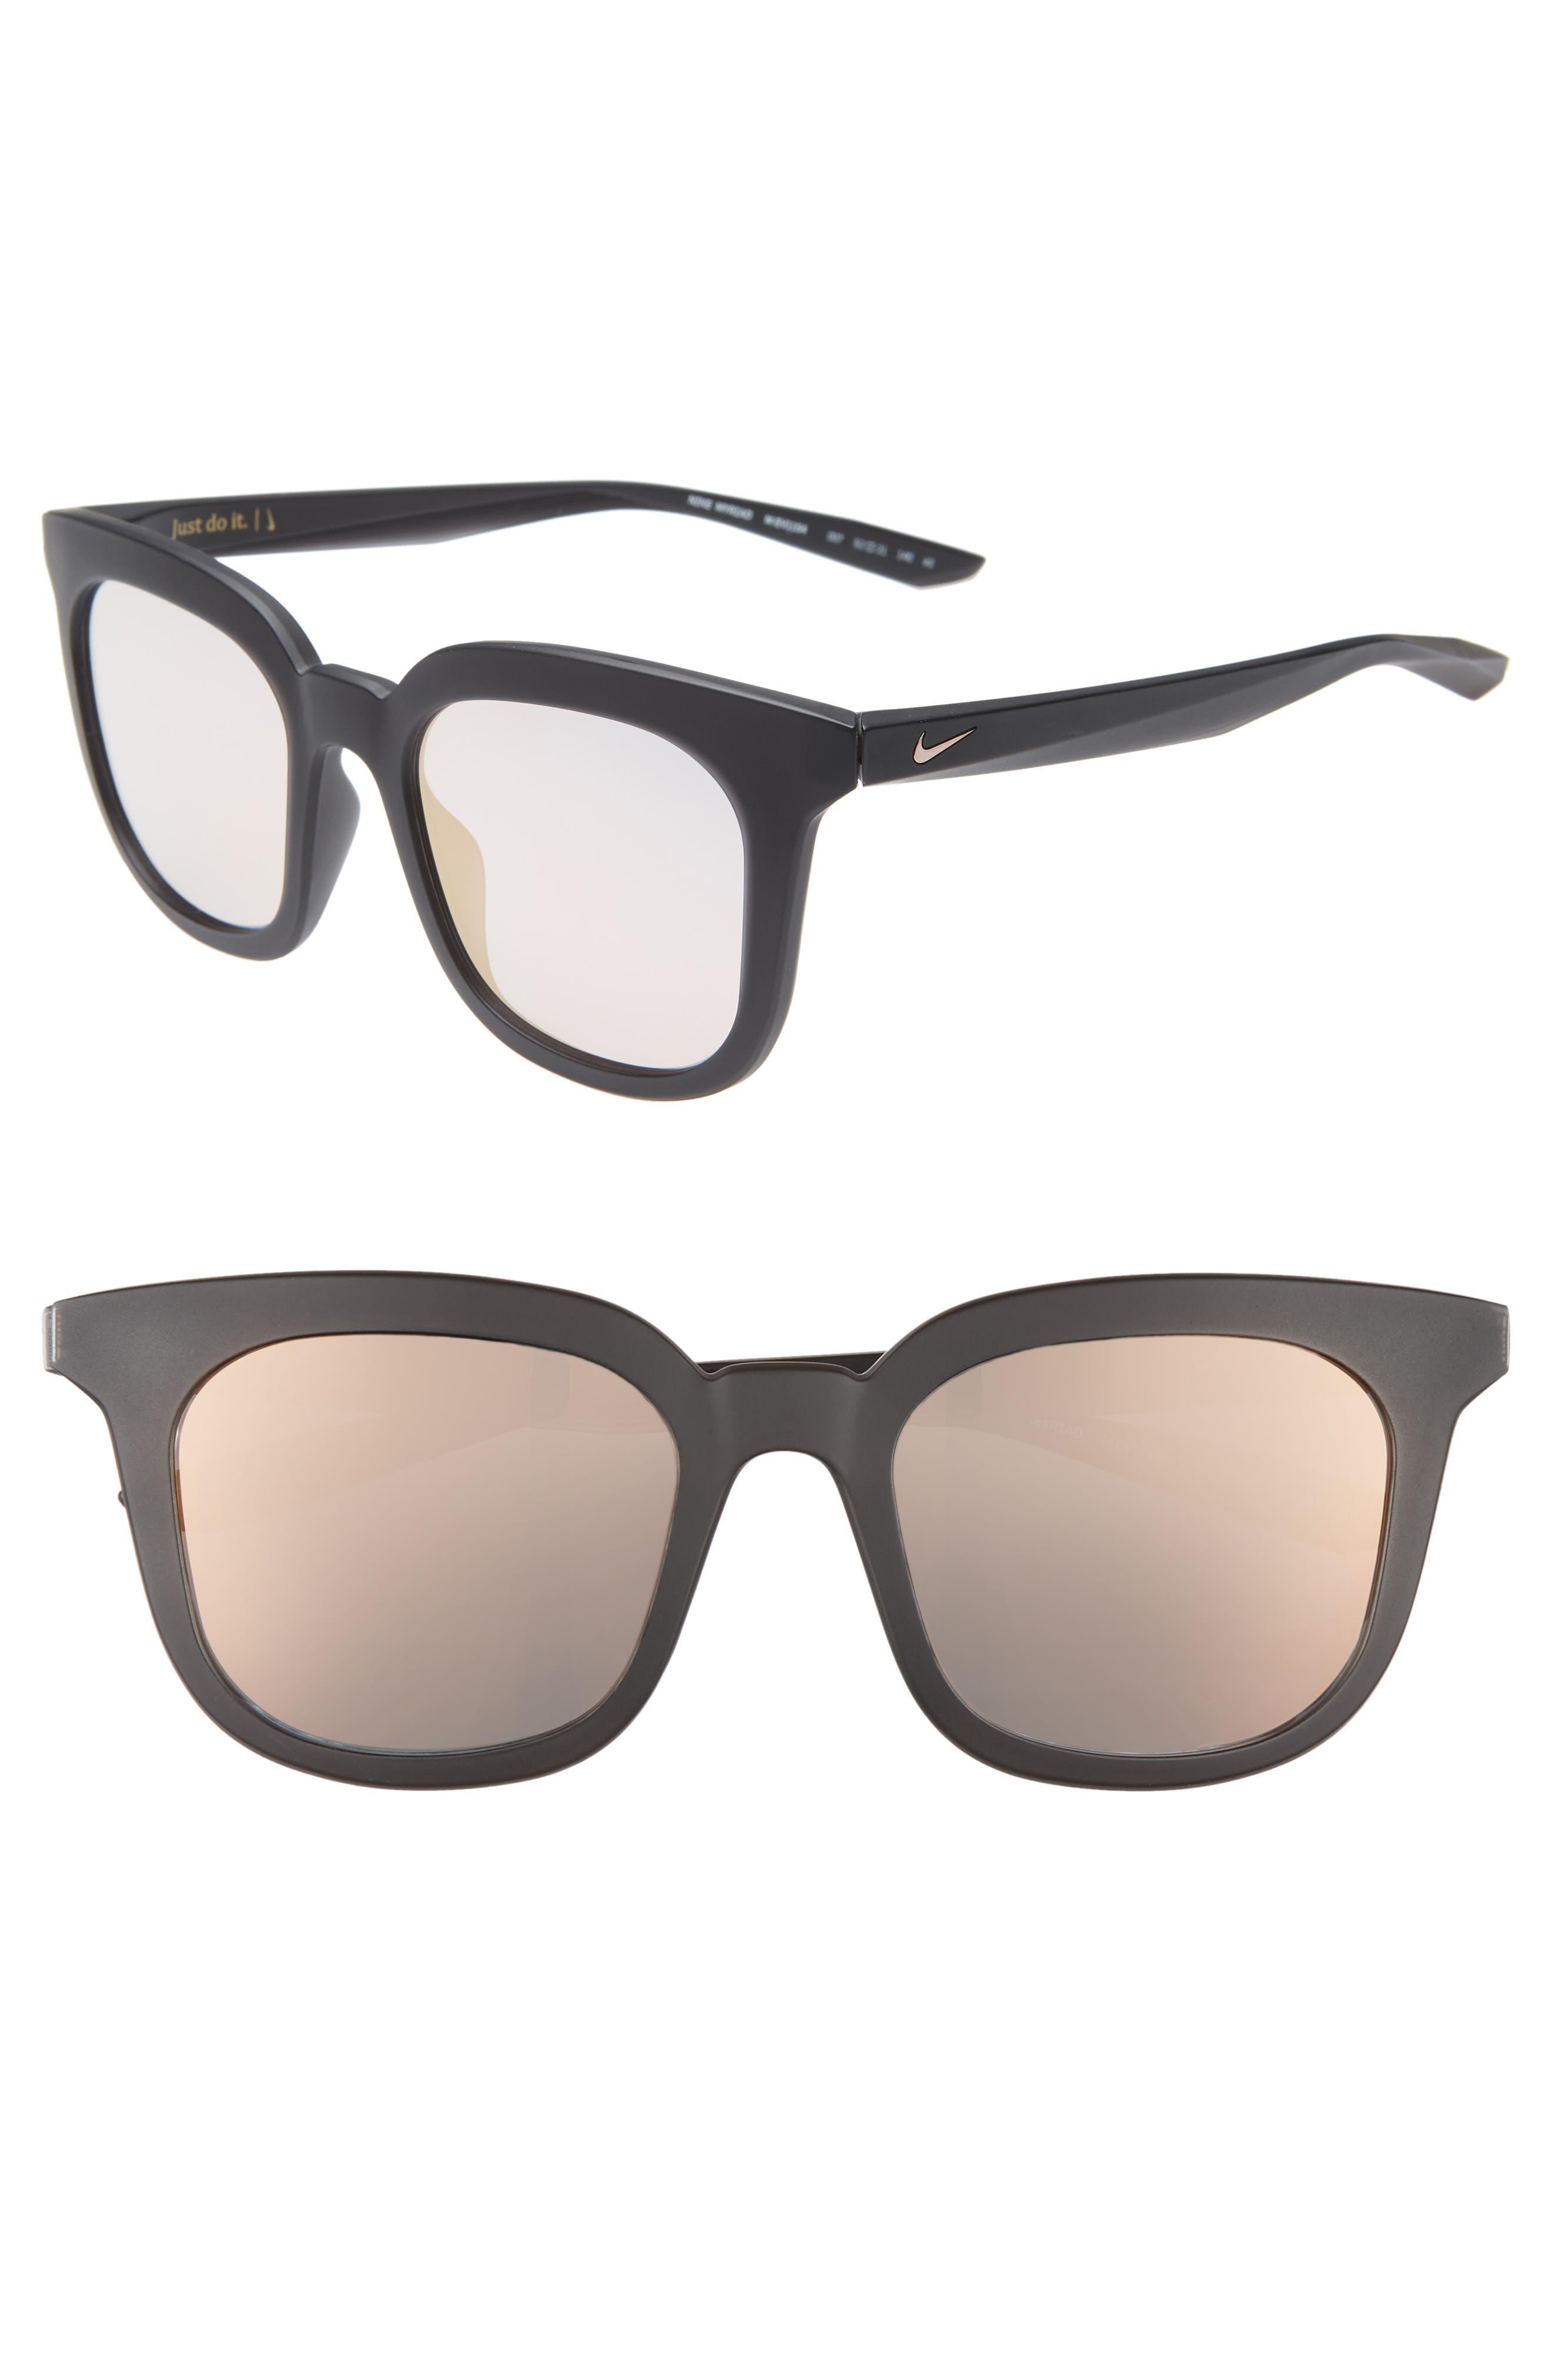 Nike Myriad 52Mm Mirrored Square Sunglasses - Matte Black/ Rose Gold